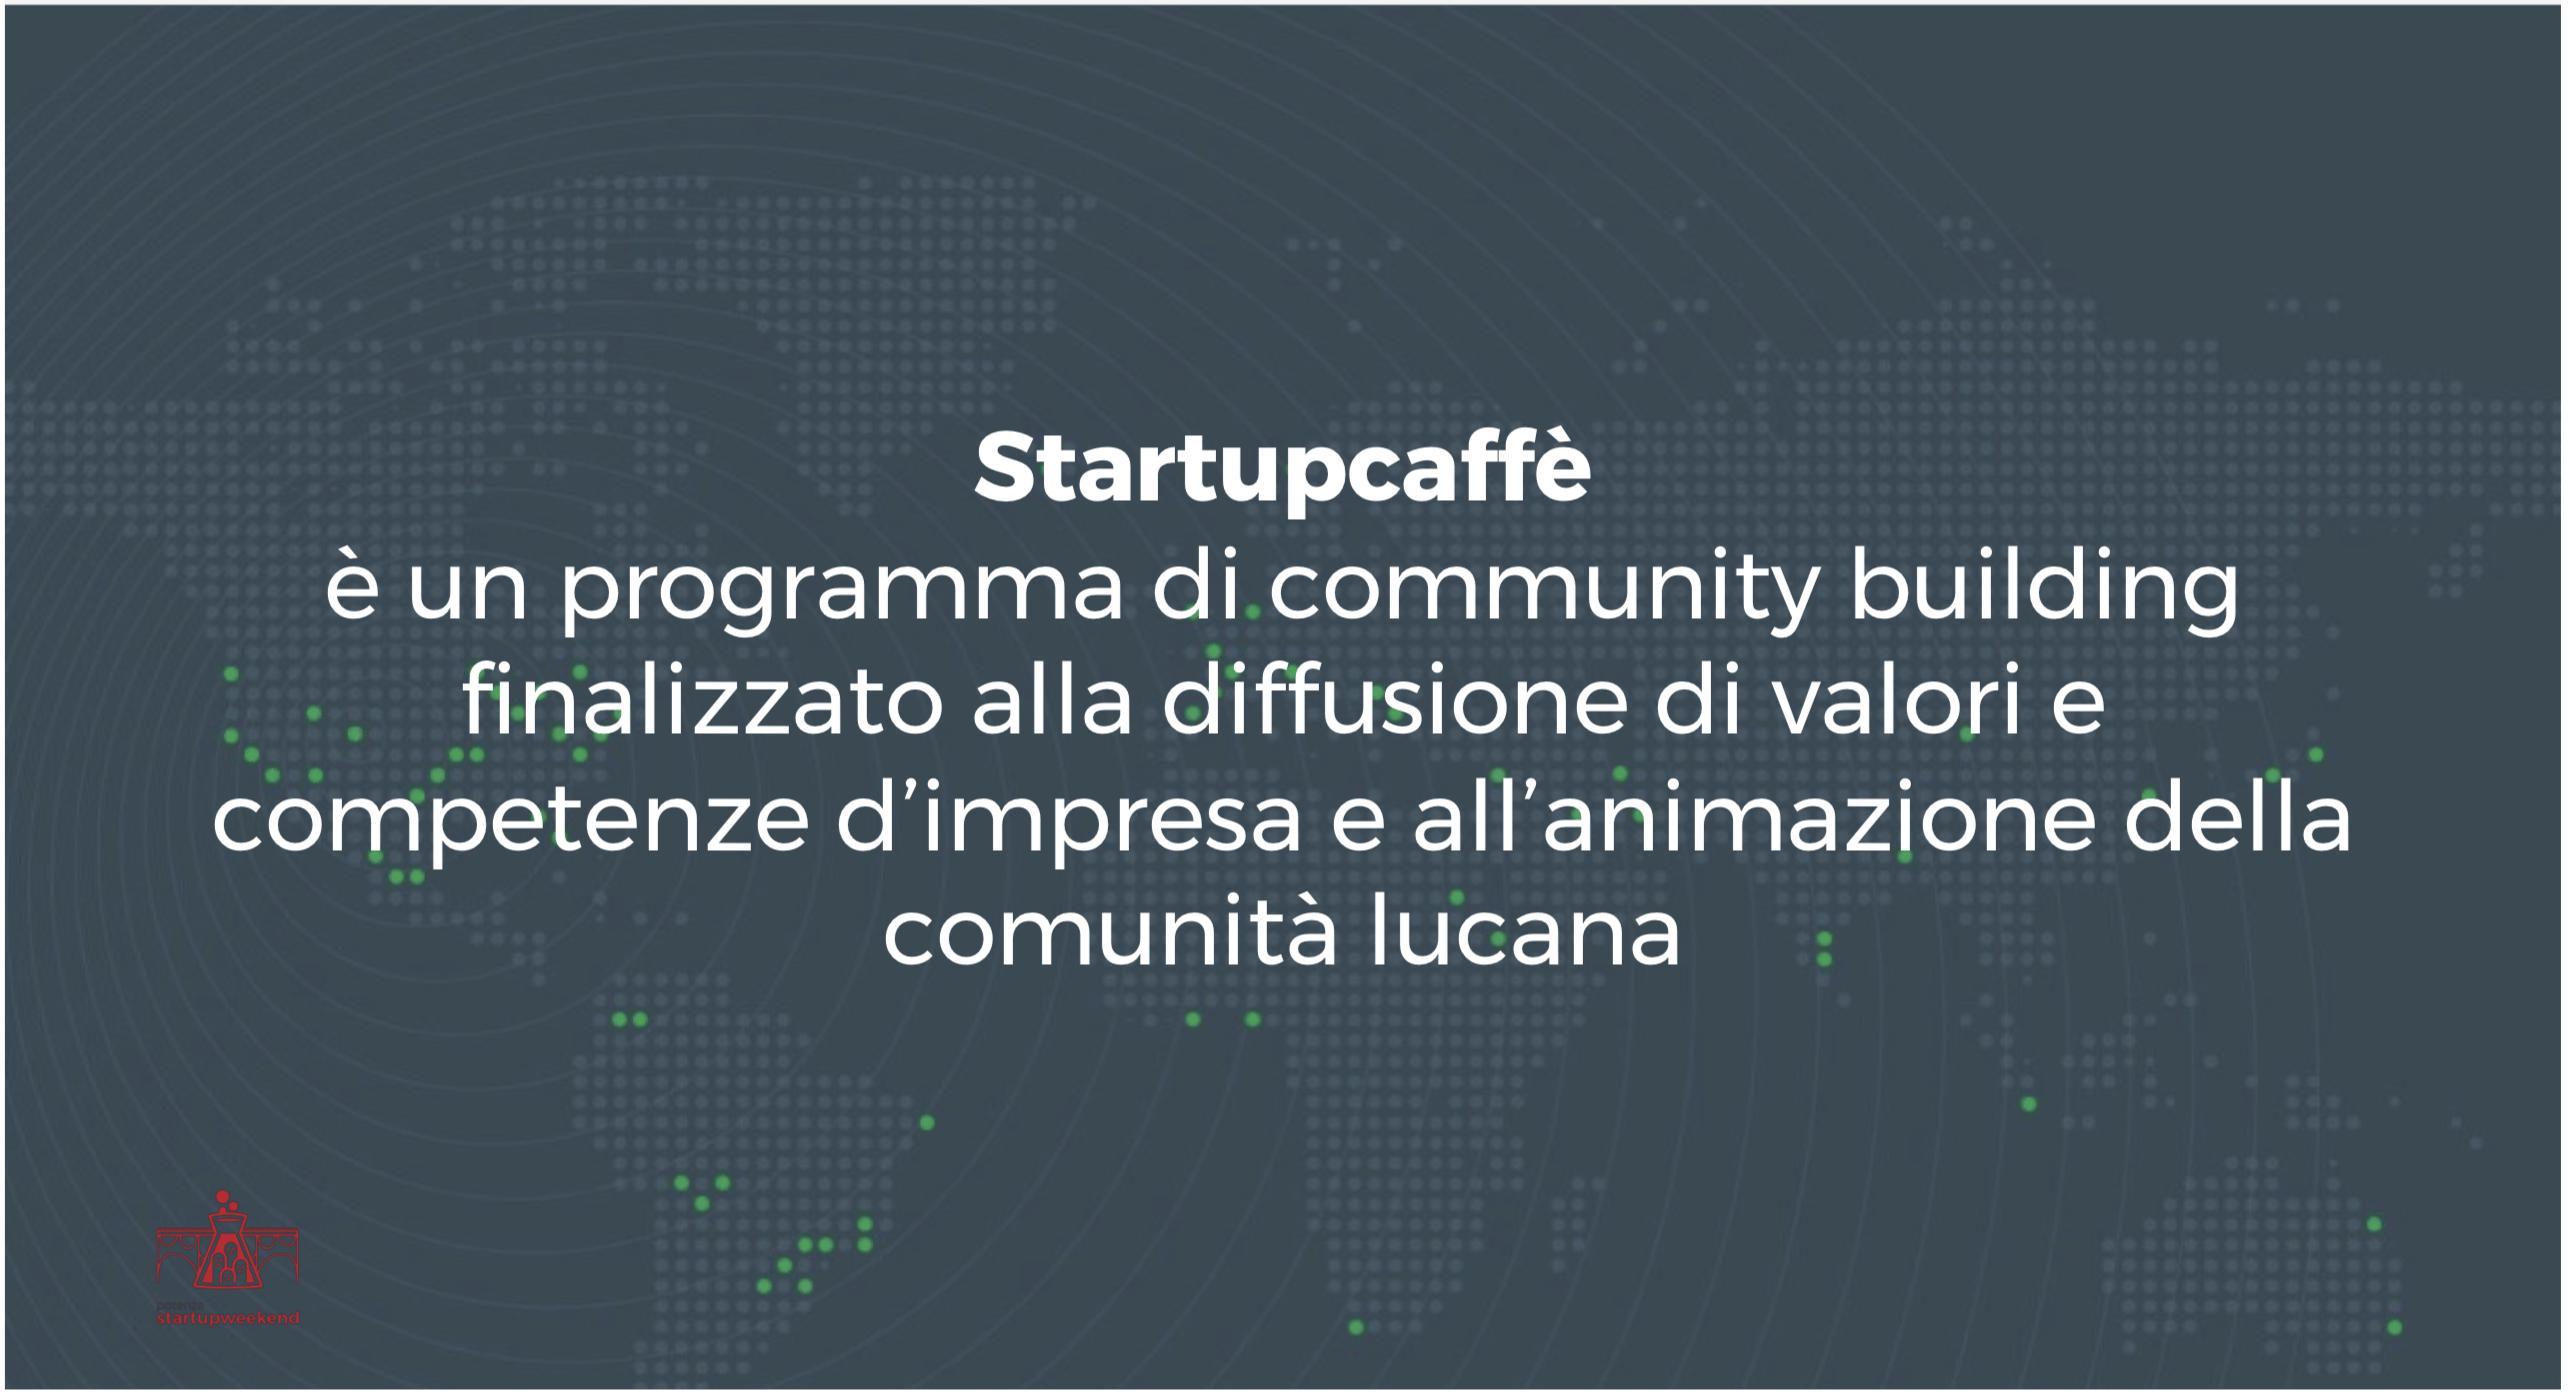 startupcaffè